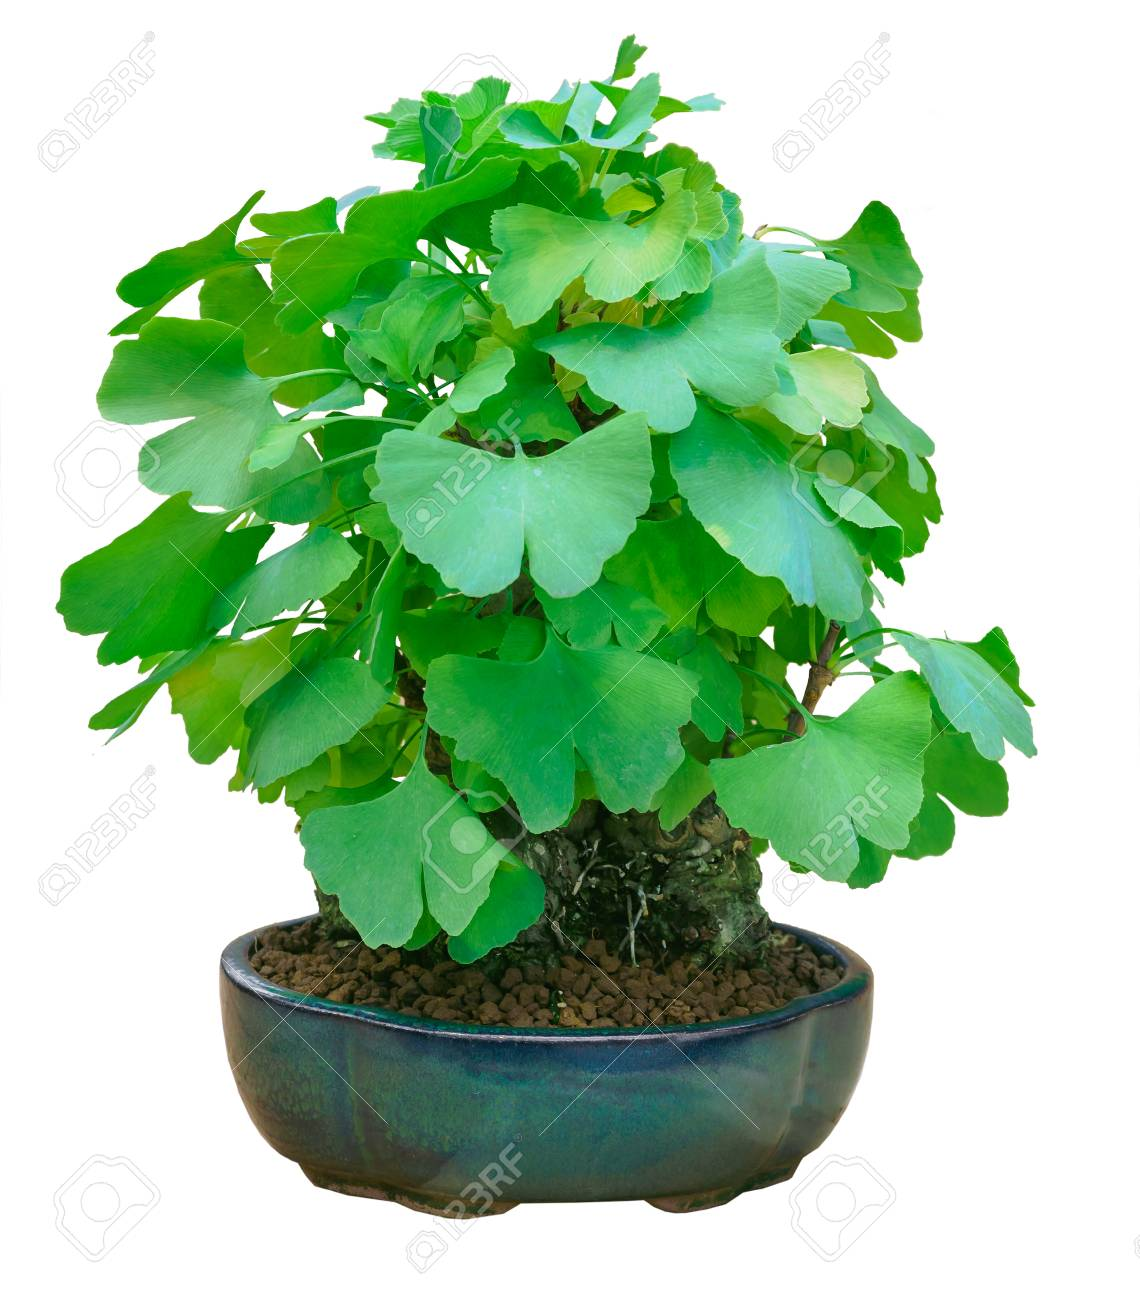 Miniature Green Bonsai Tree Ginkgo Biloba Isolated Stock Photo